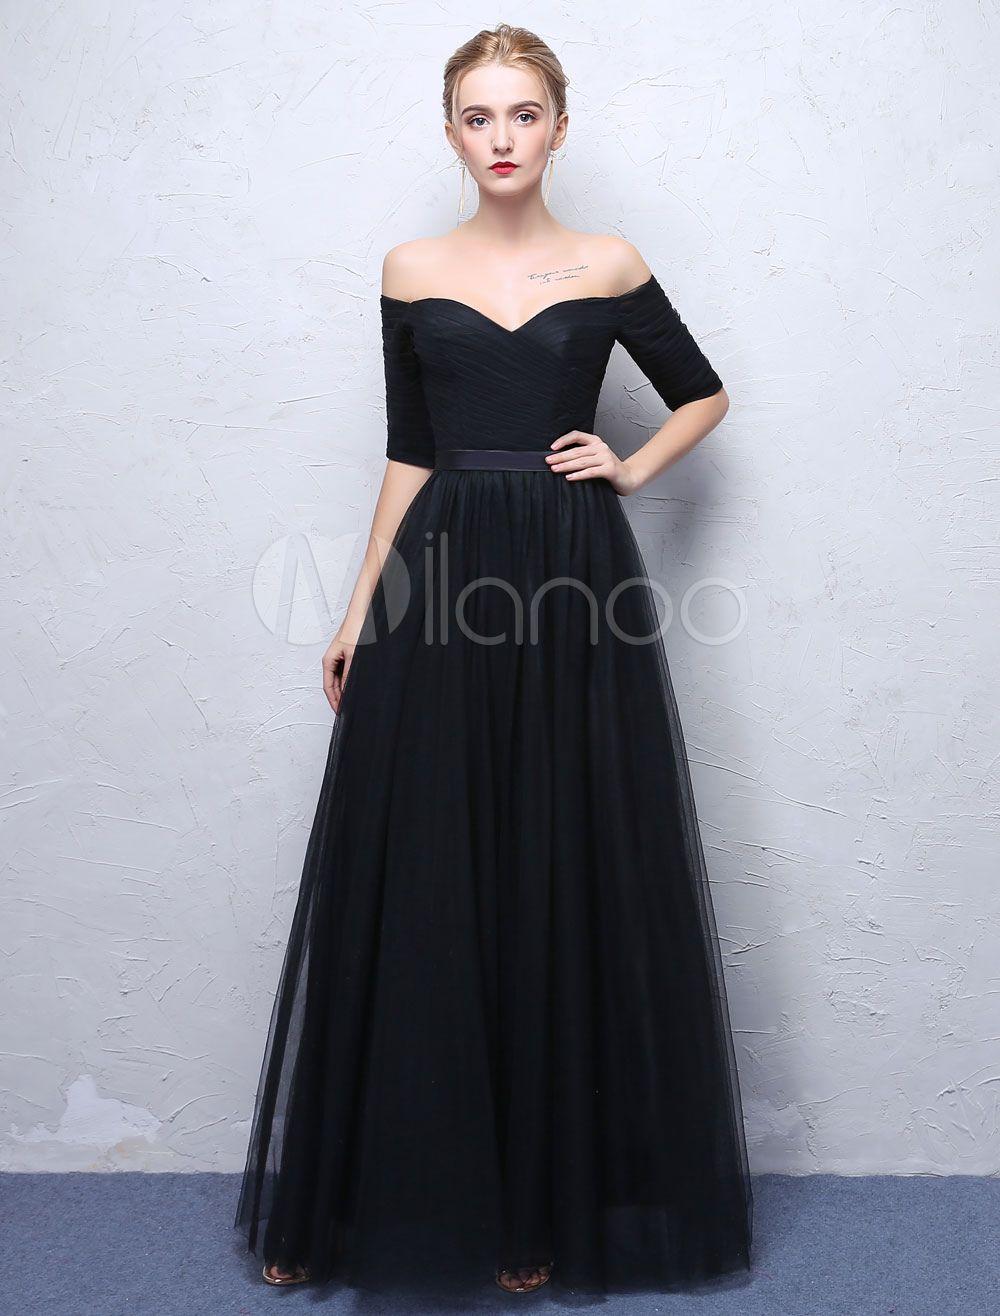 Evening 2019 Half Shoulder Dress Prom The Black Off Long Dresses qxEpn0w4